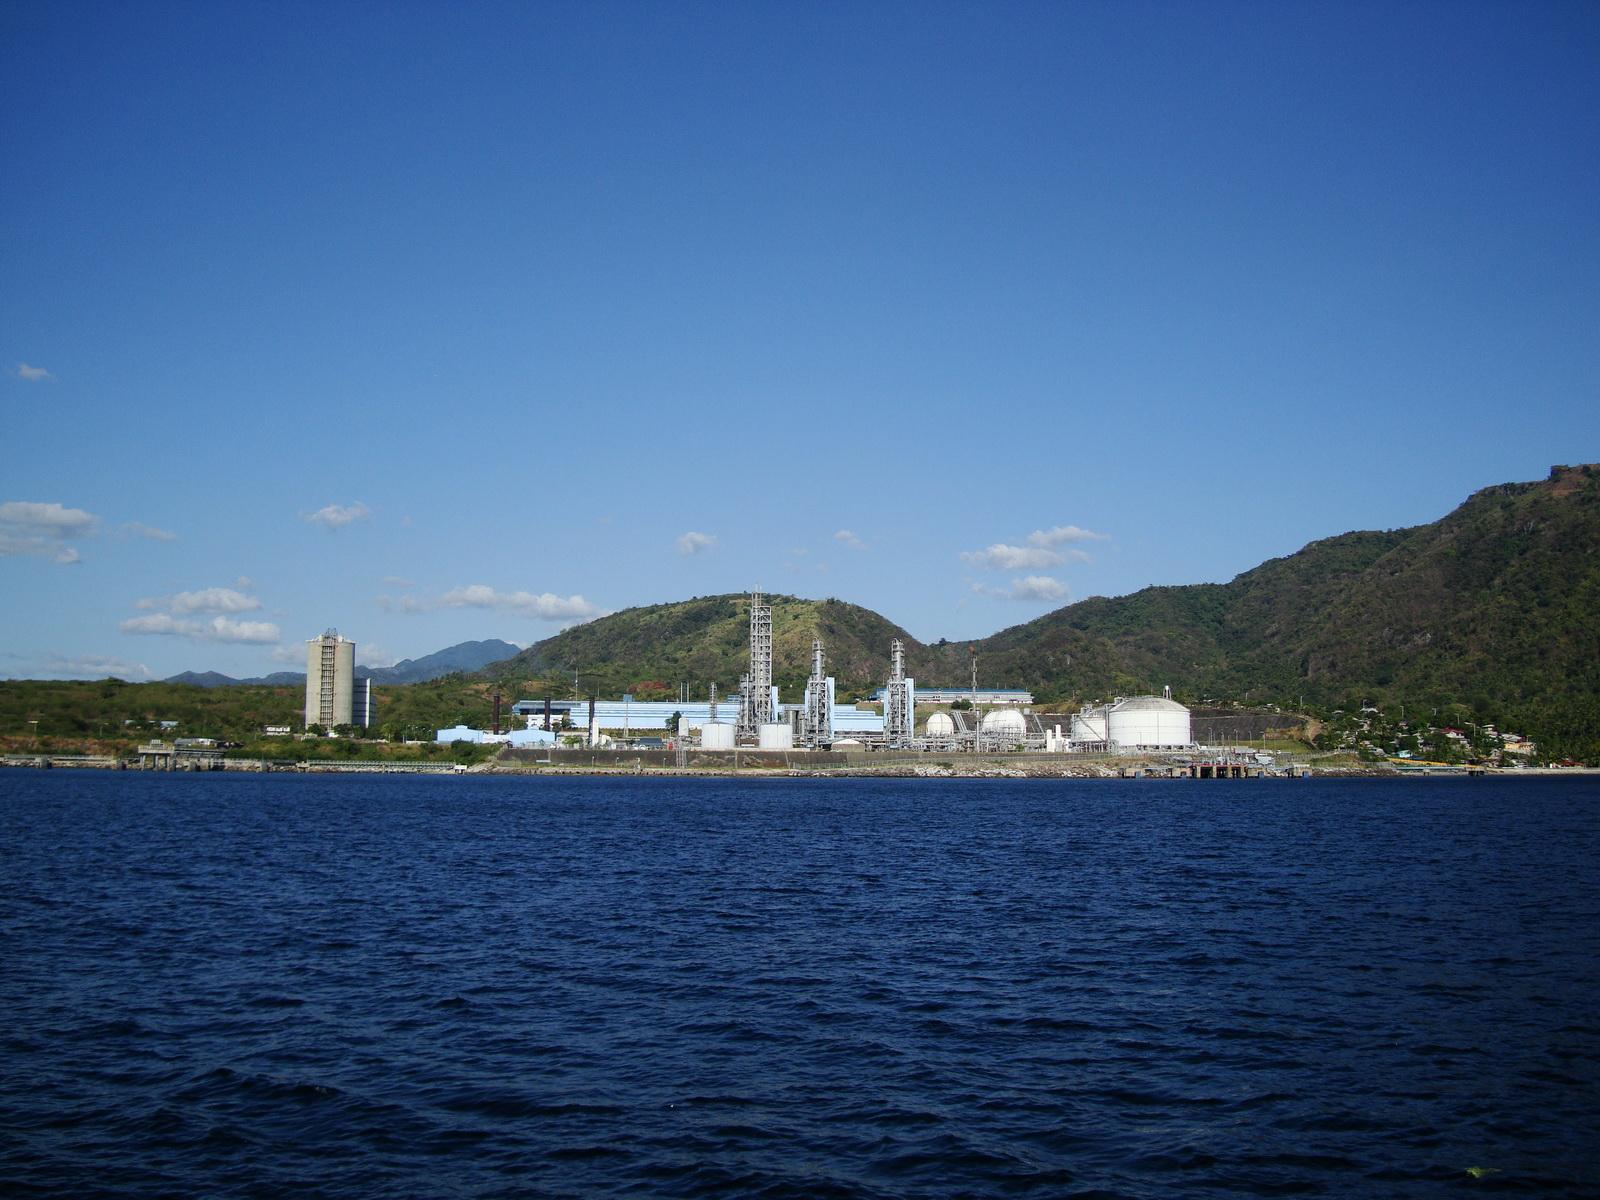 Batangas JG Summit Petrochemical Plant Anilao area Batangas 04